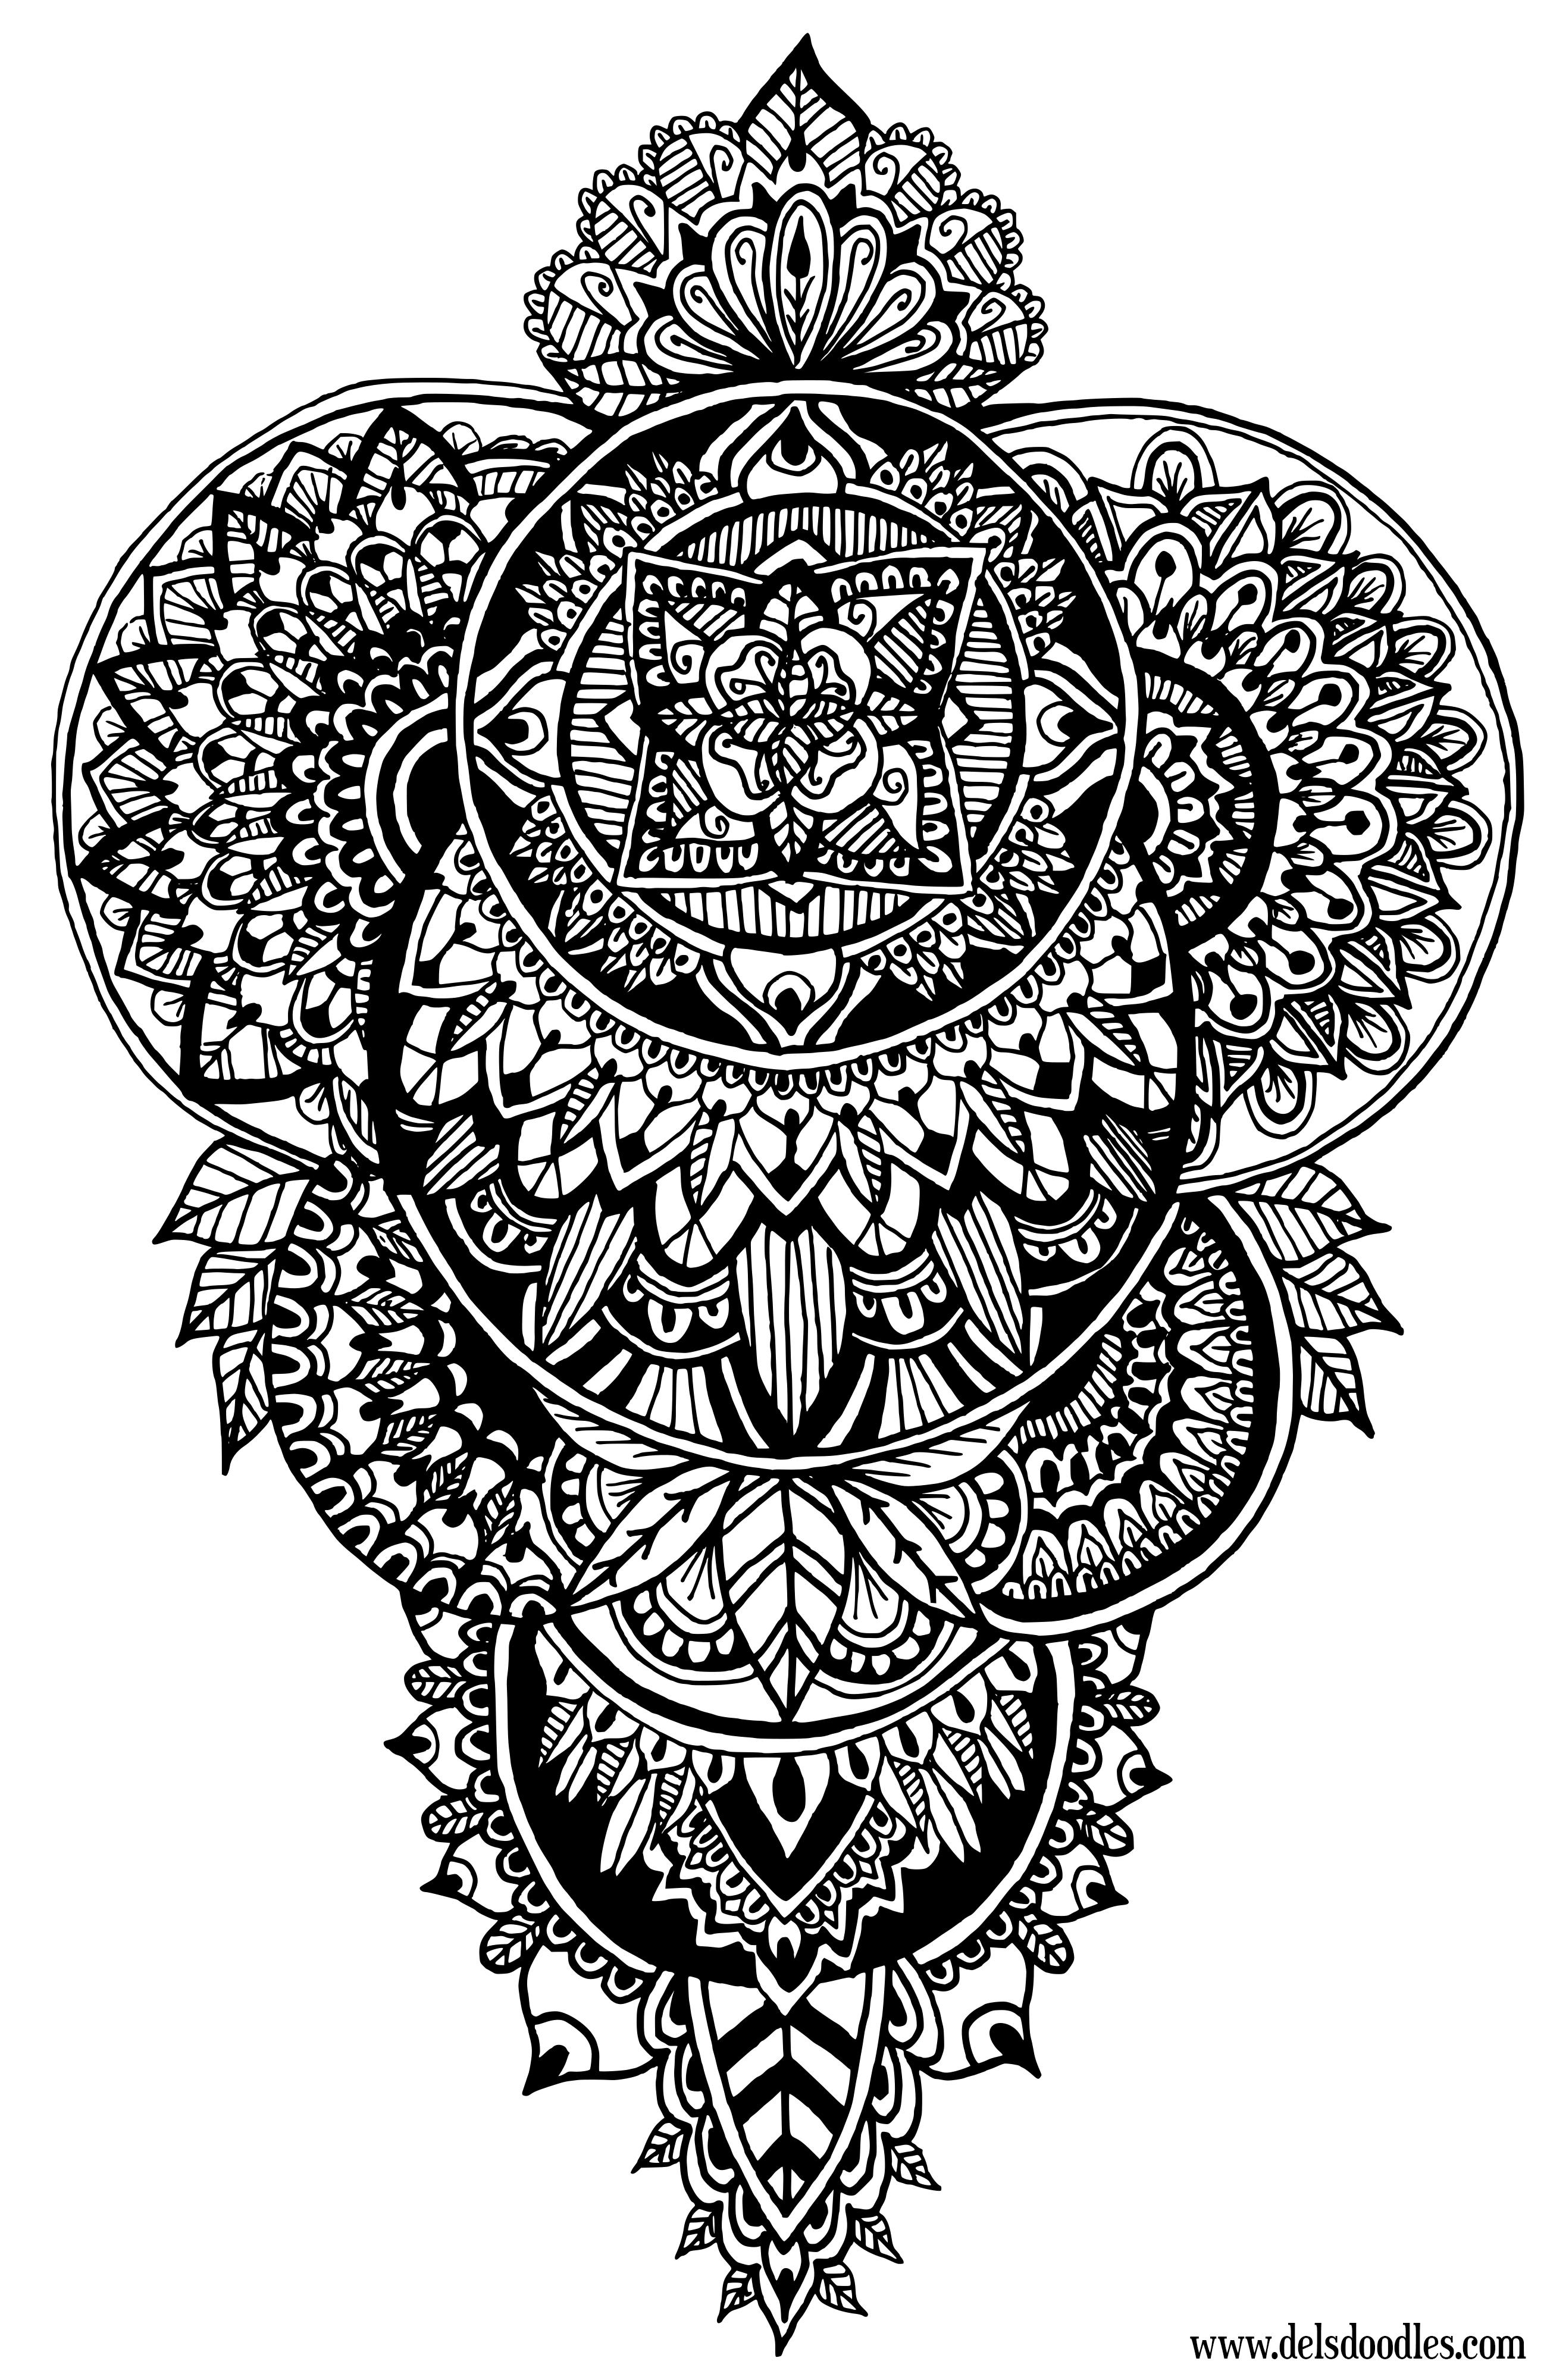 Random doodles - Doodle dessin ...